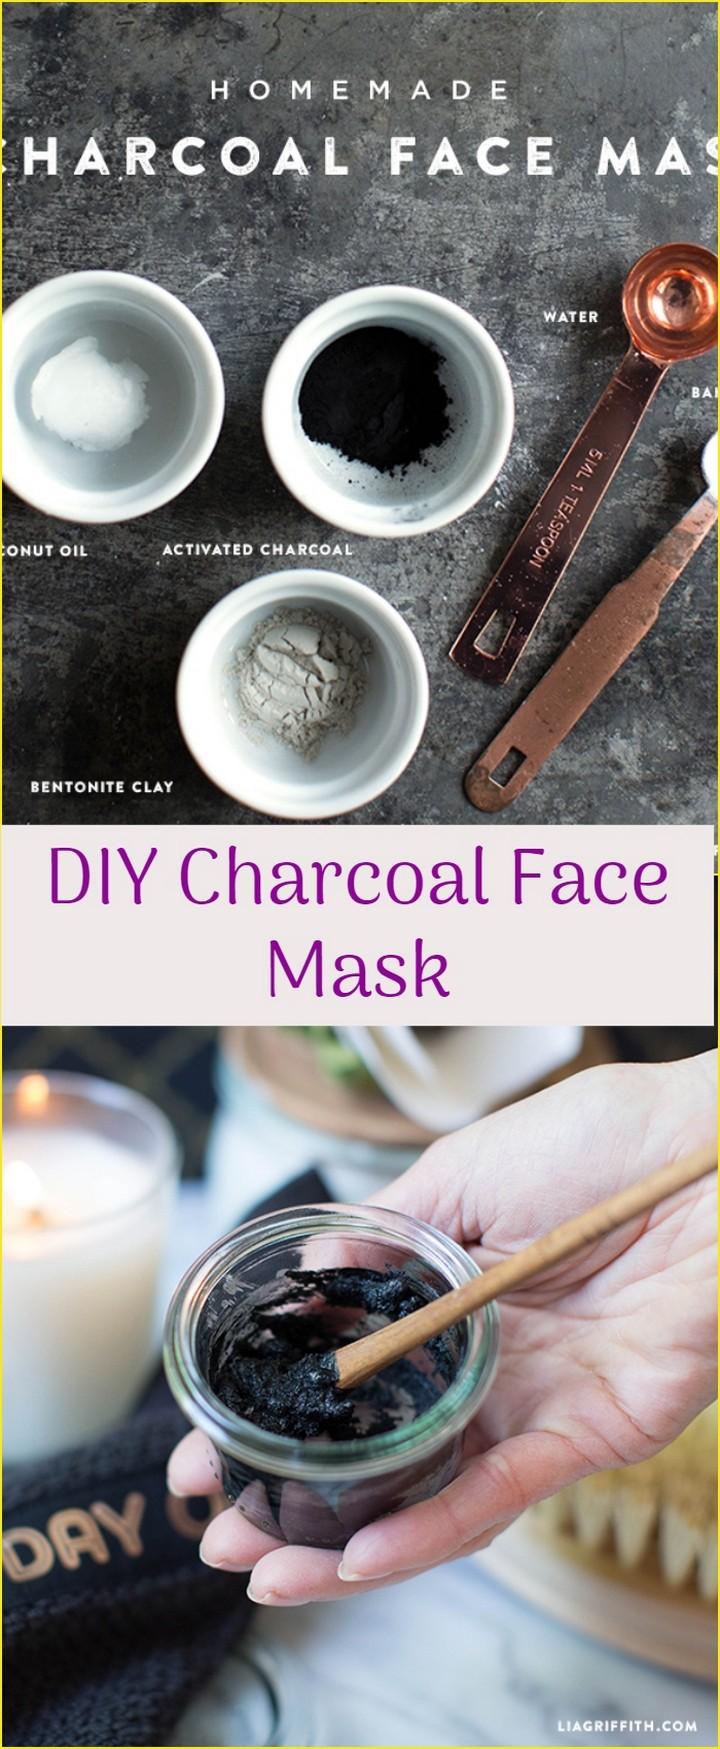 DIY Charcoal Face Mask 1